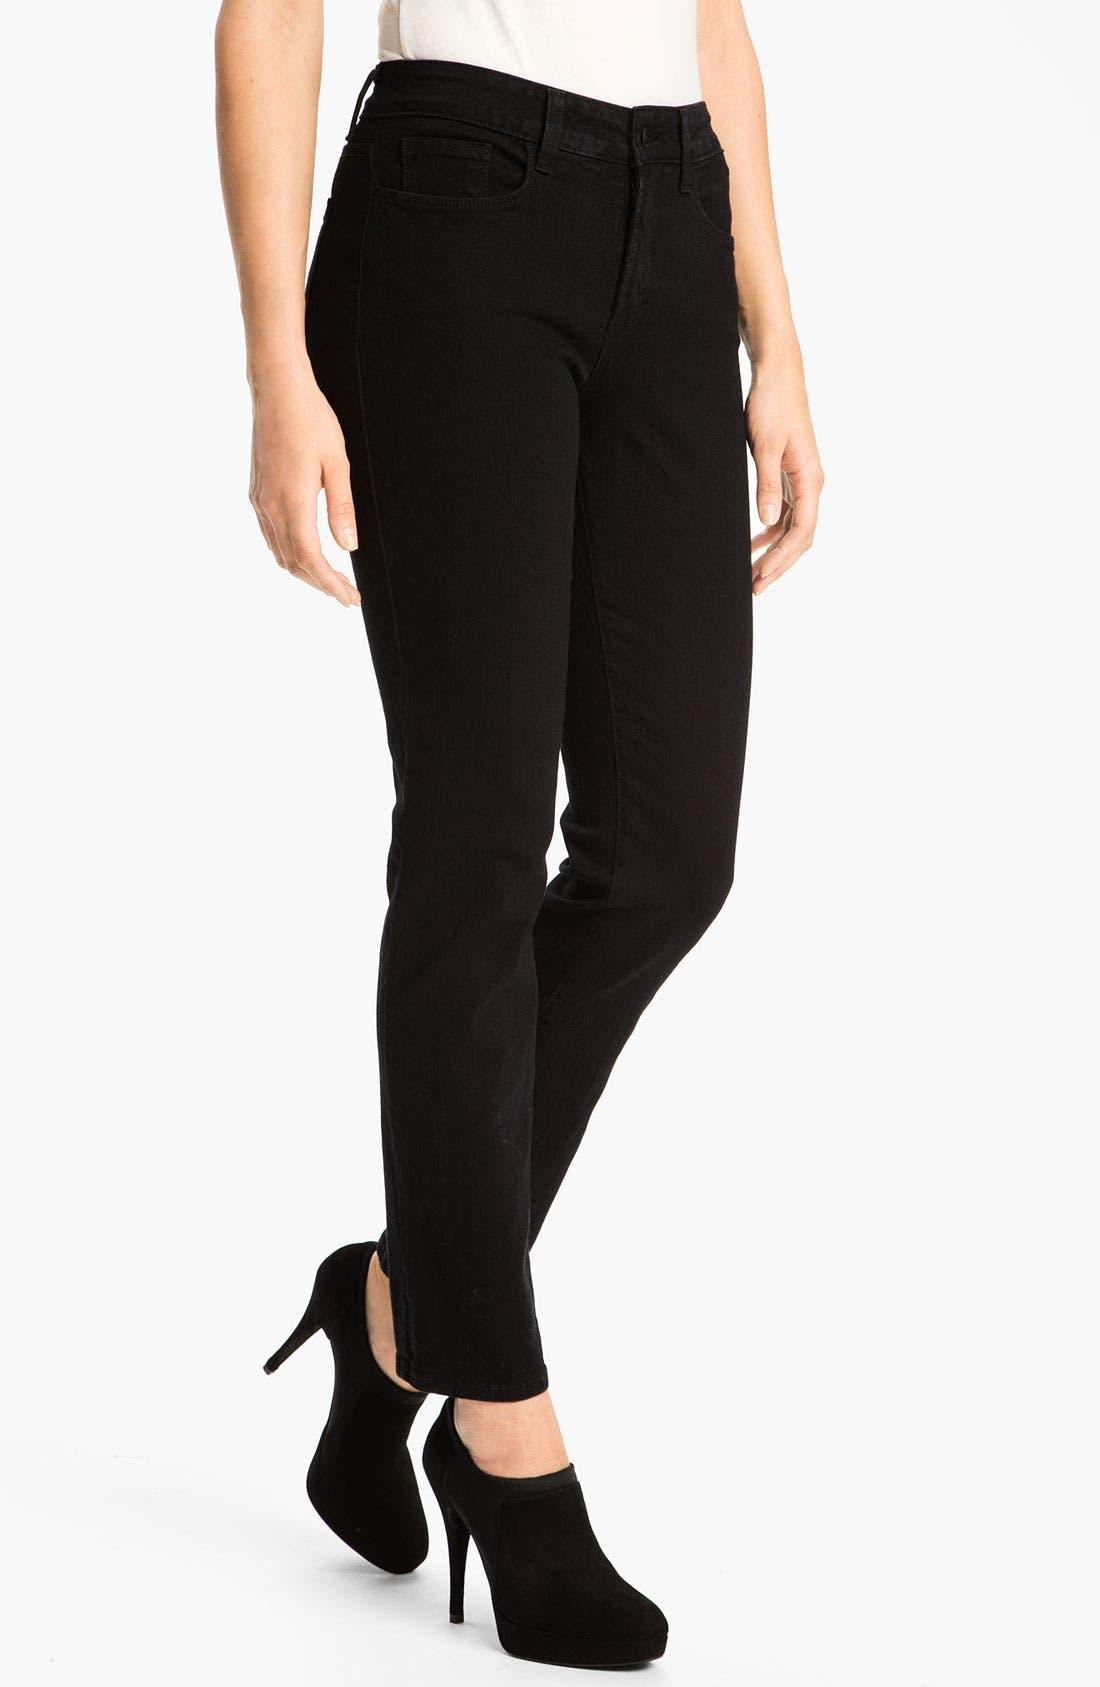 'Sheri' Stretch Skinny Jeans,                             Main thumbnail 1, color,                             001